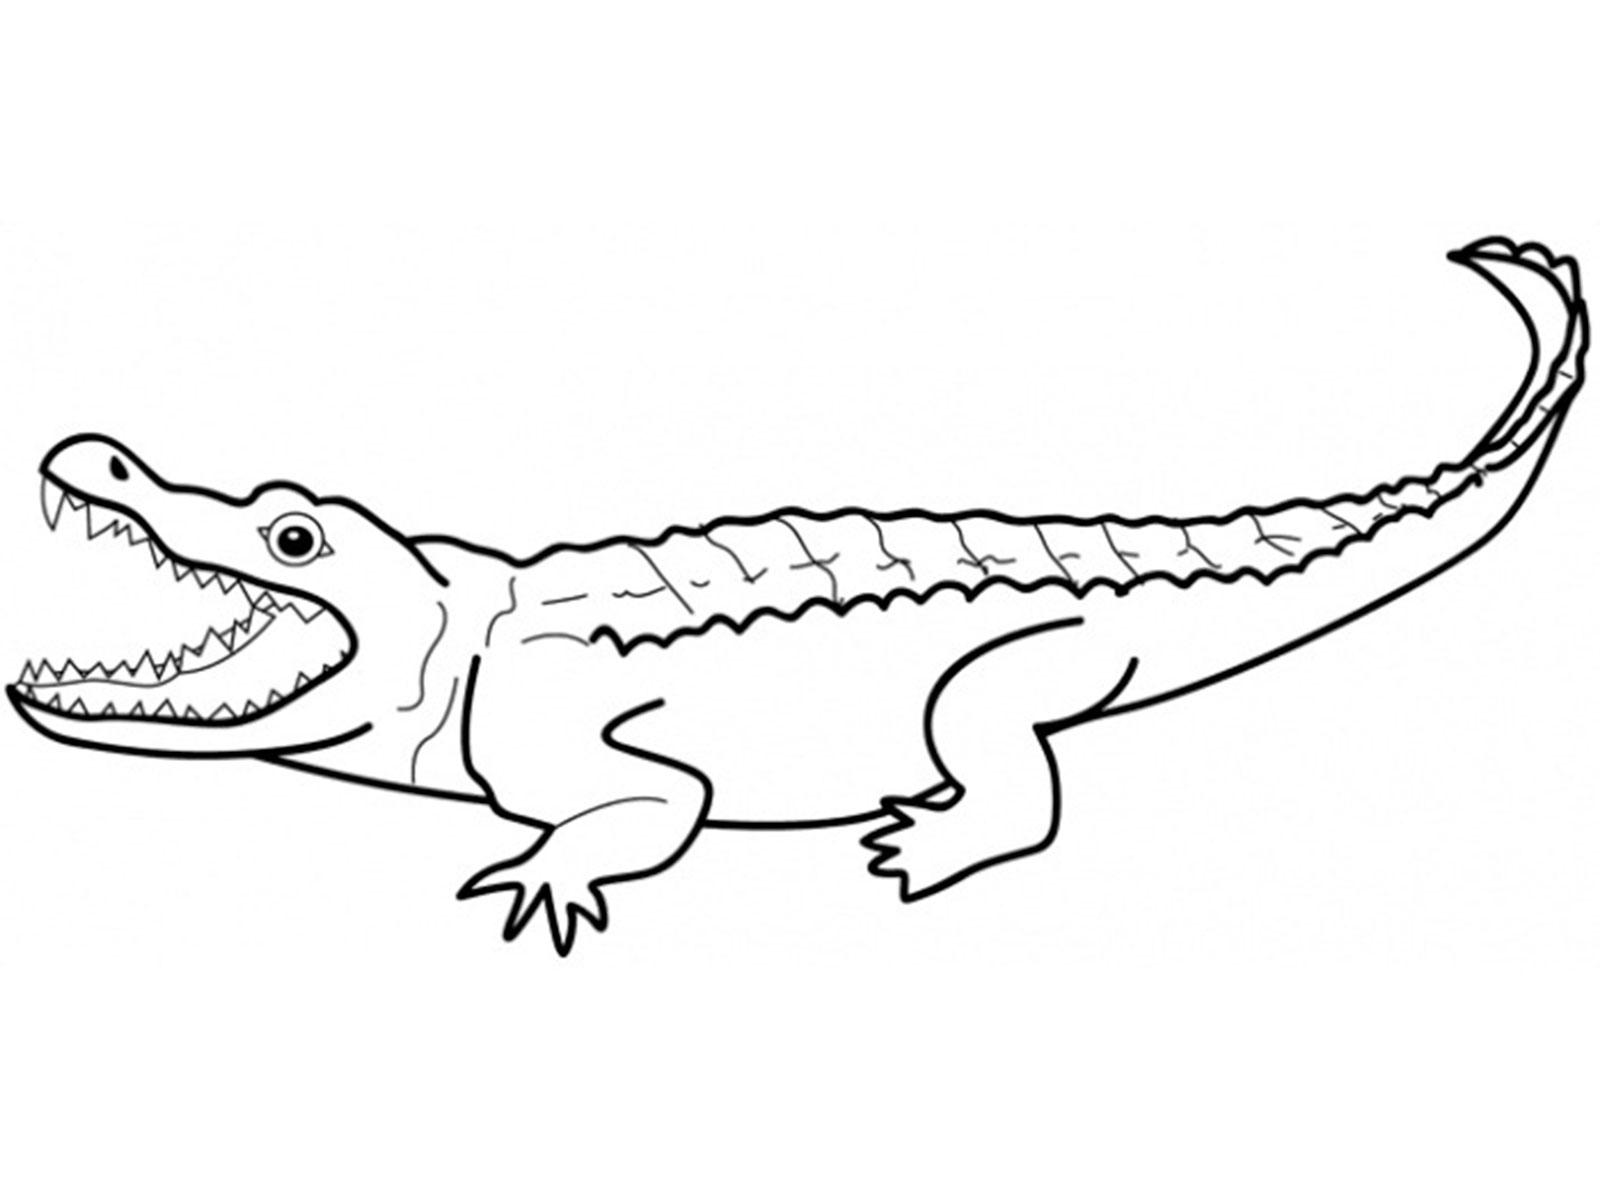 Nile Crocodile Drawing